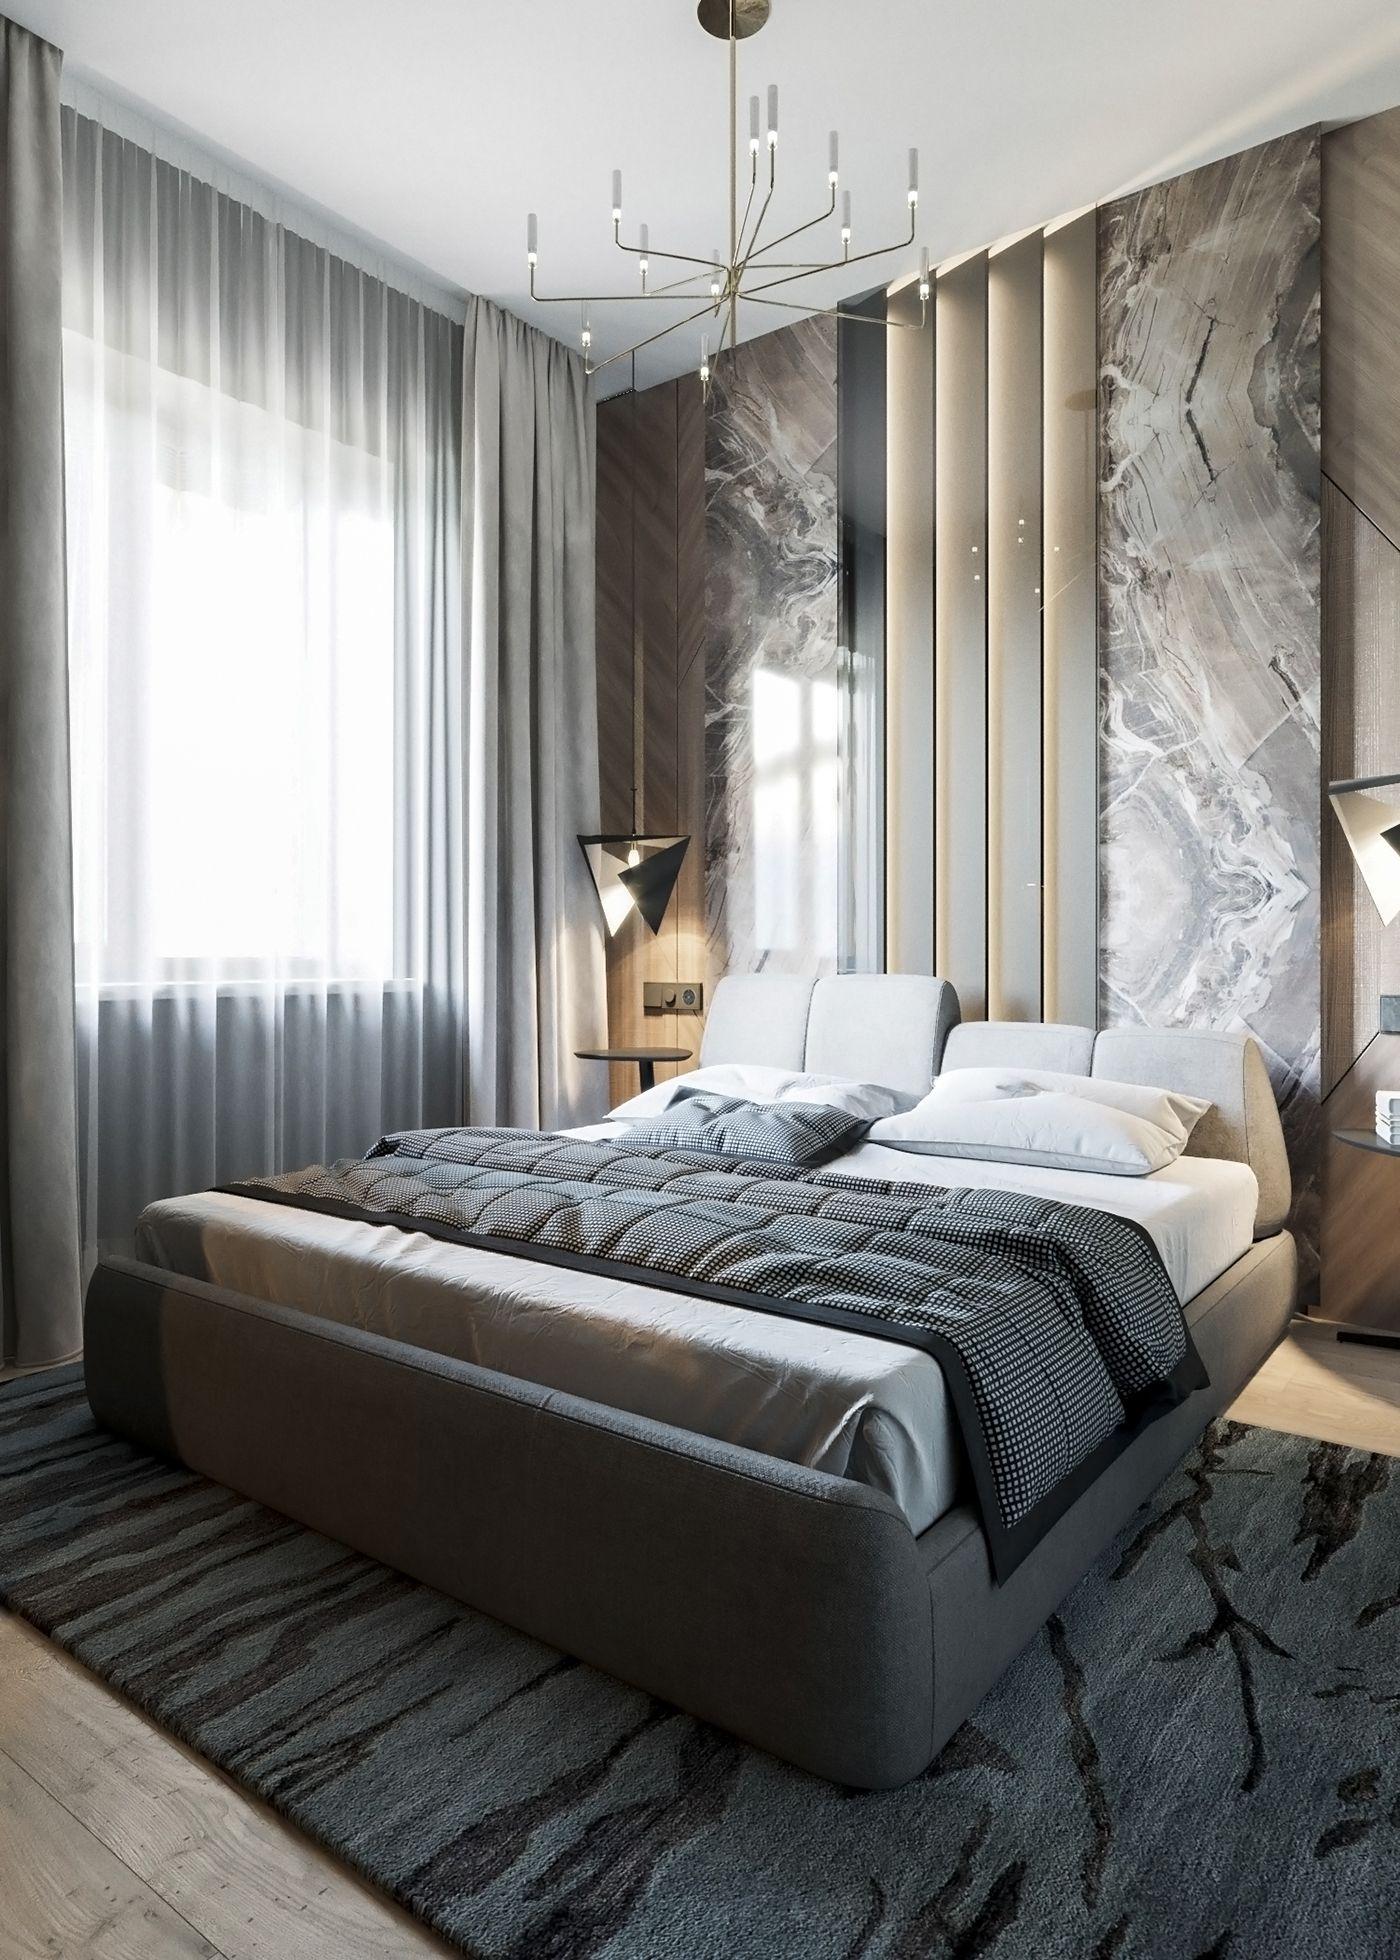 BEDROOM on Behance | Modern luxury bedroom